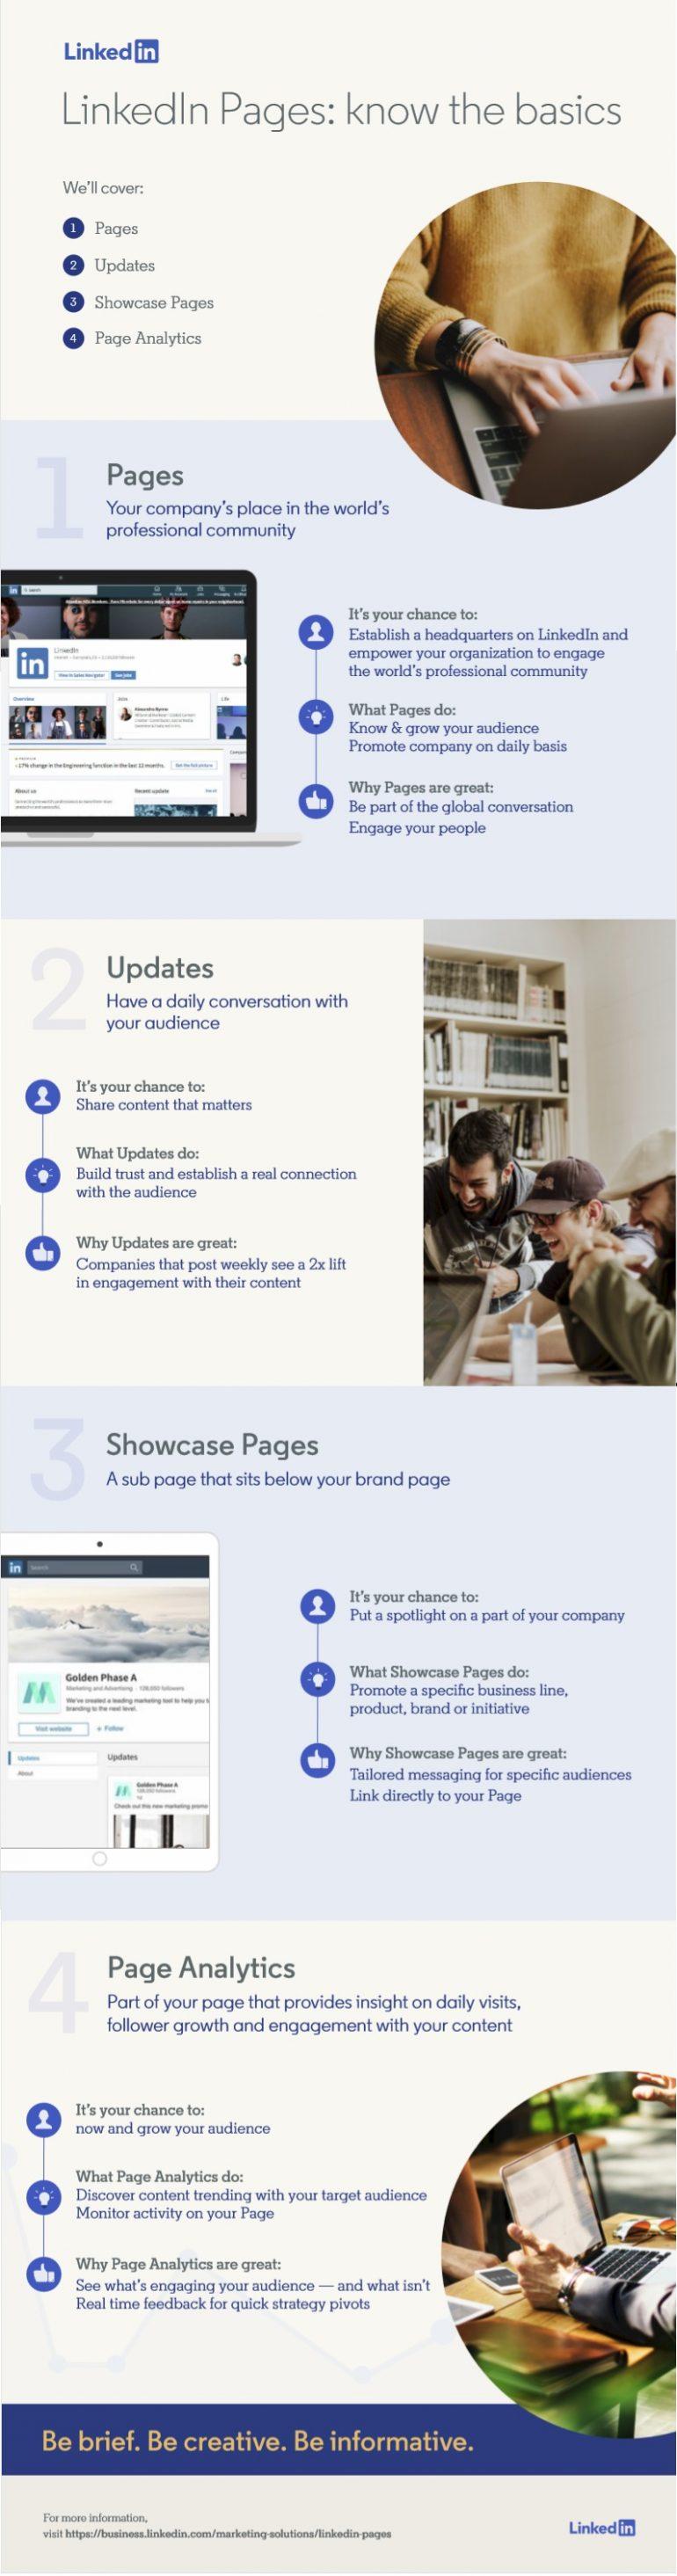 linkedin bedrijfspagina infographic